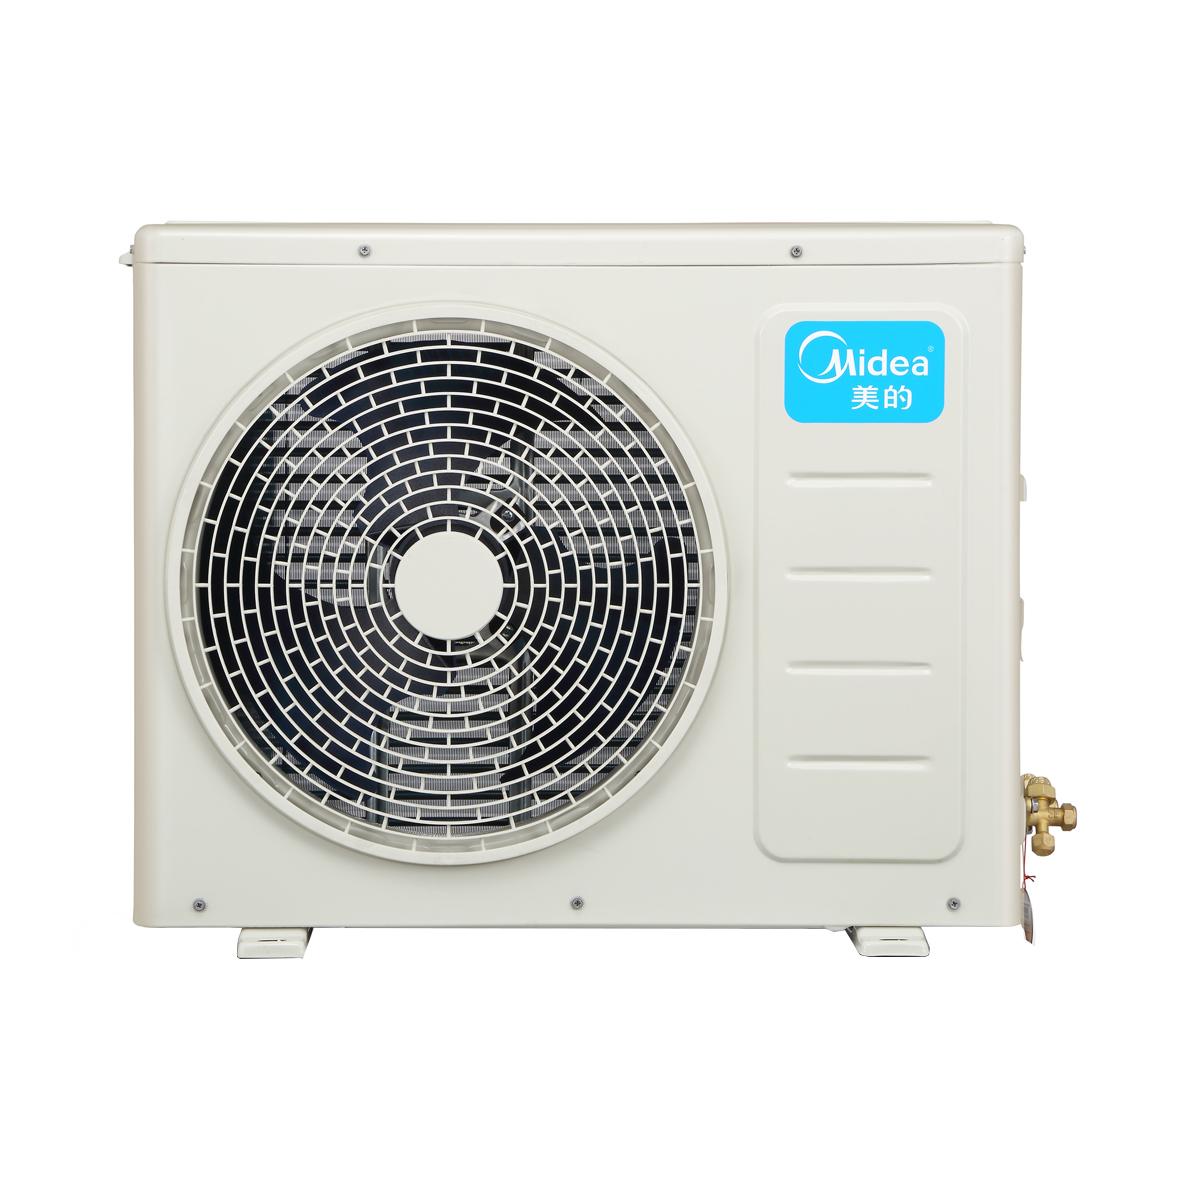 Midea/美的 KFR-26T2W/BP2DN1-TR风管机套机 说明书.pdf